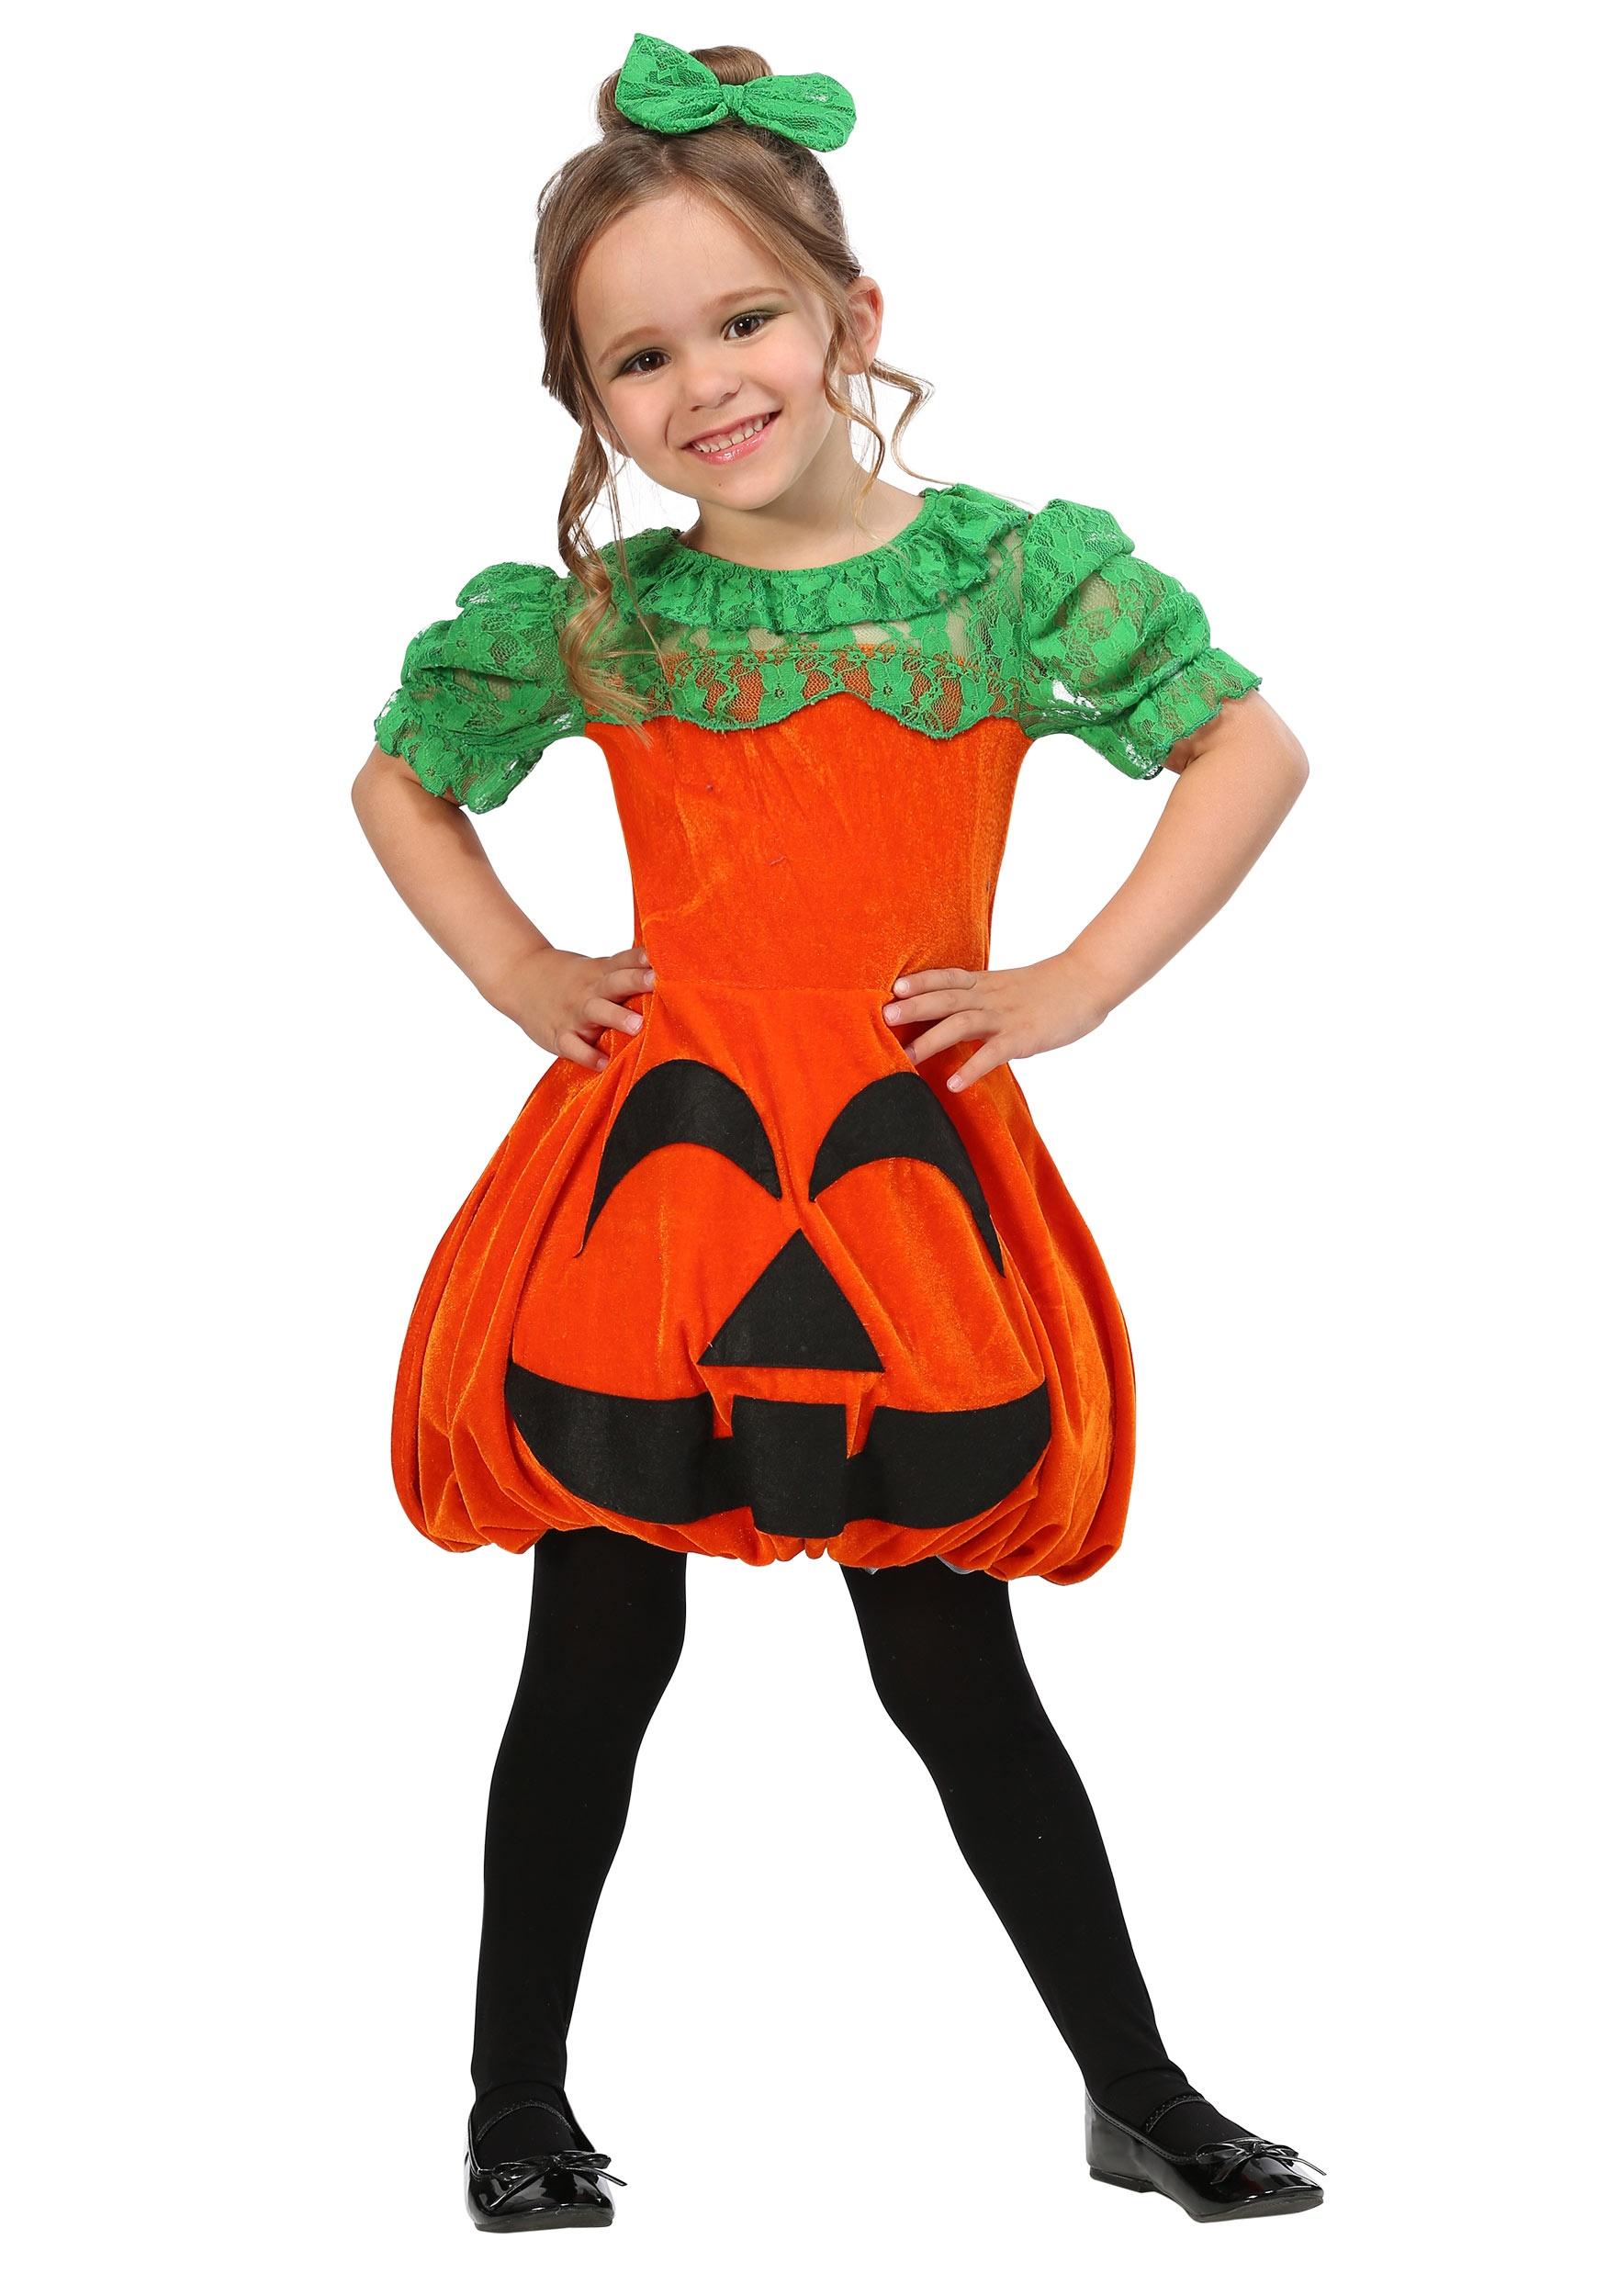 food costumes kids and drink halloween costume ideas sc 1 st cartoonviewco